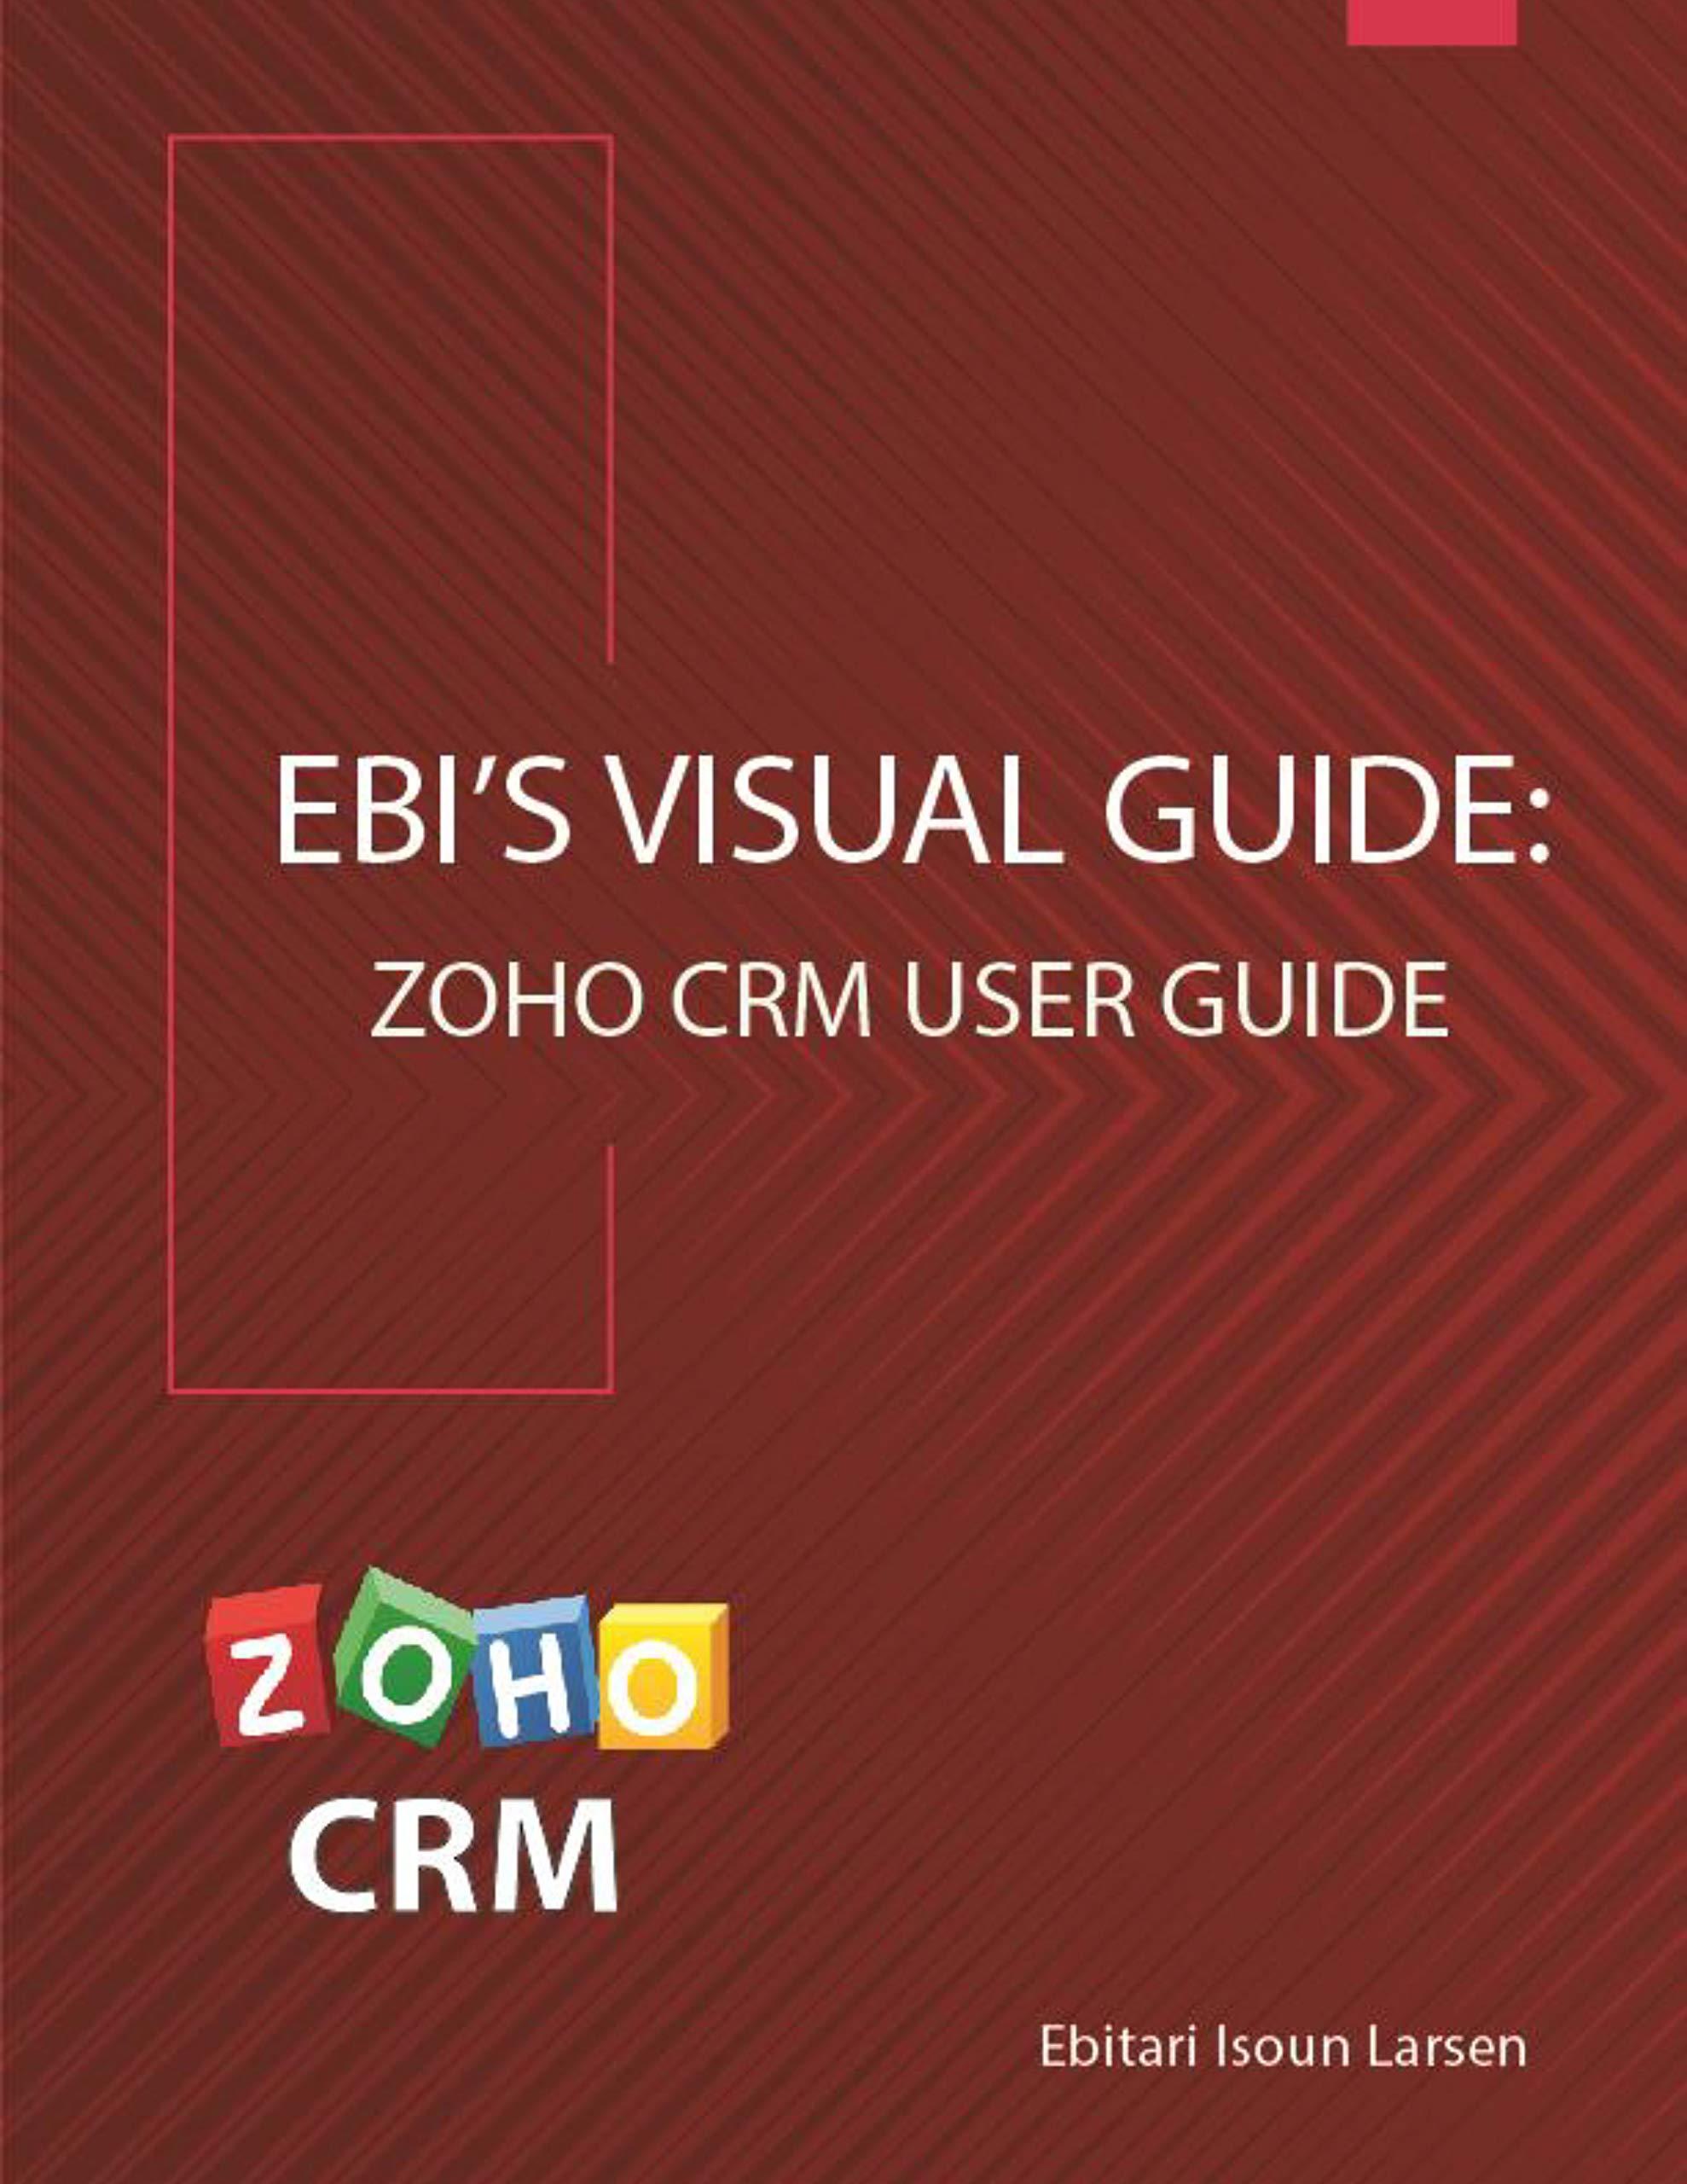 Ebi's Visual Guide: Zoho CRM User Guide (English Edition)